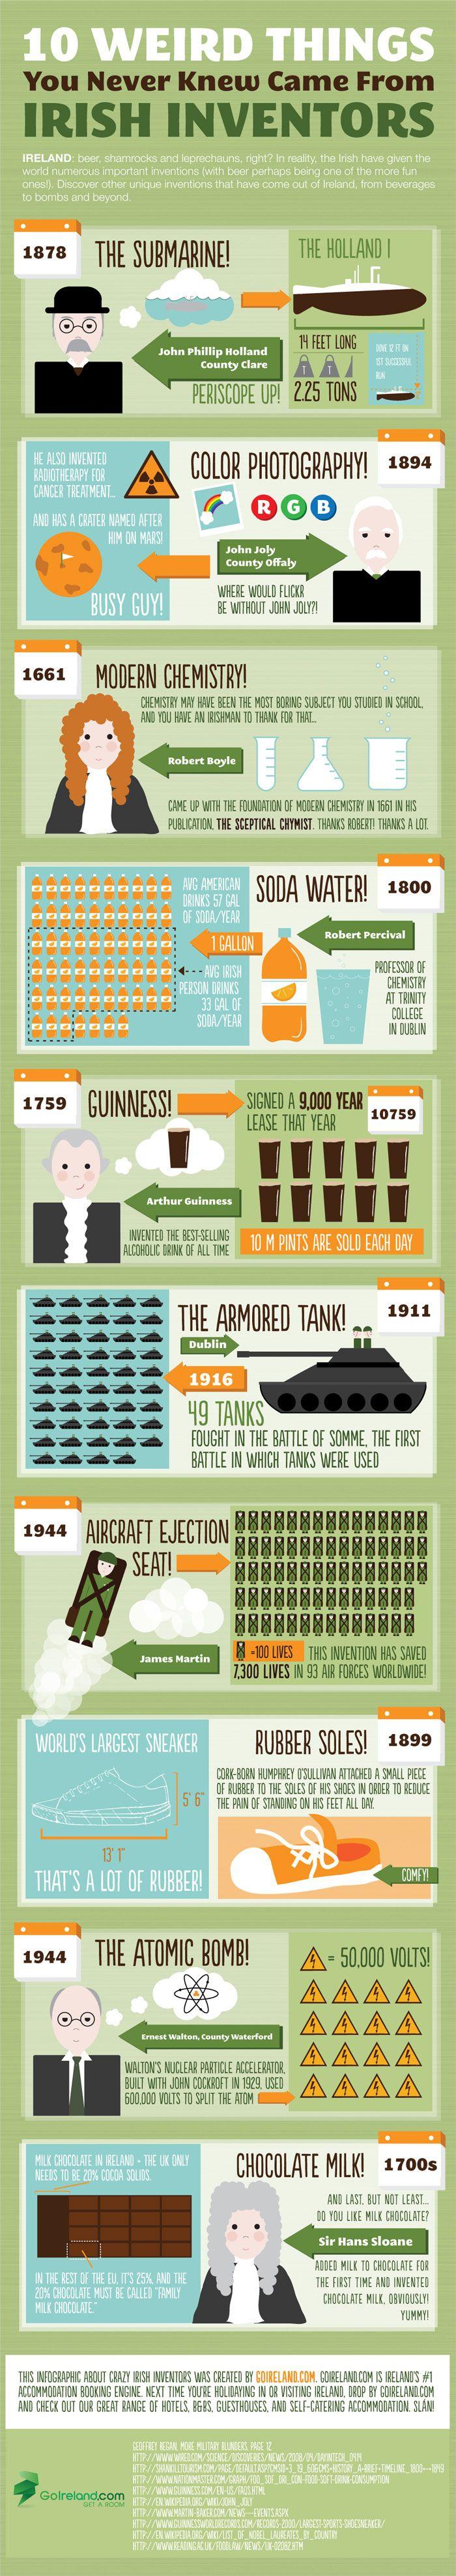 Irish inventions. Soda water is my favorite!